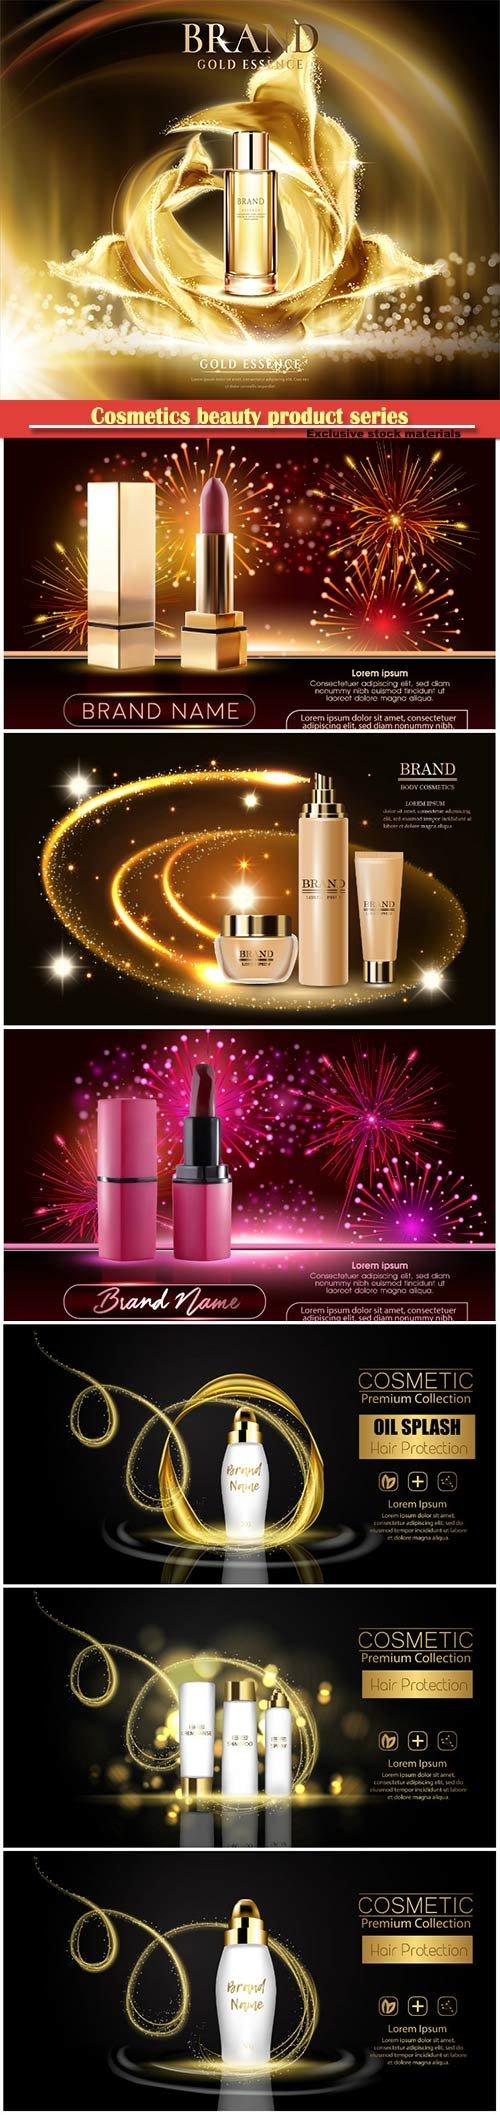 Cosmetics beauty product series, presentation banners mockup, vector illustration